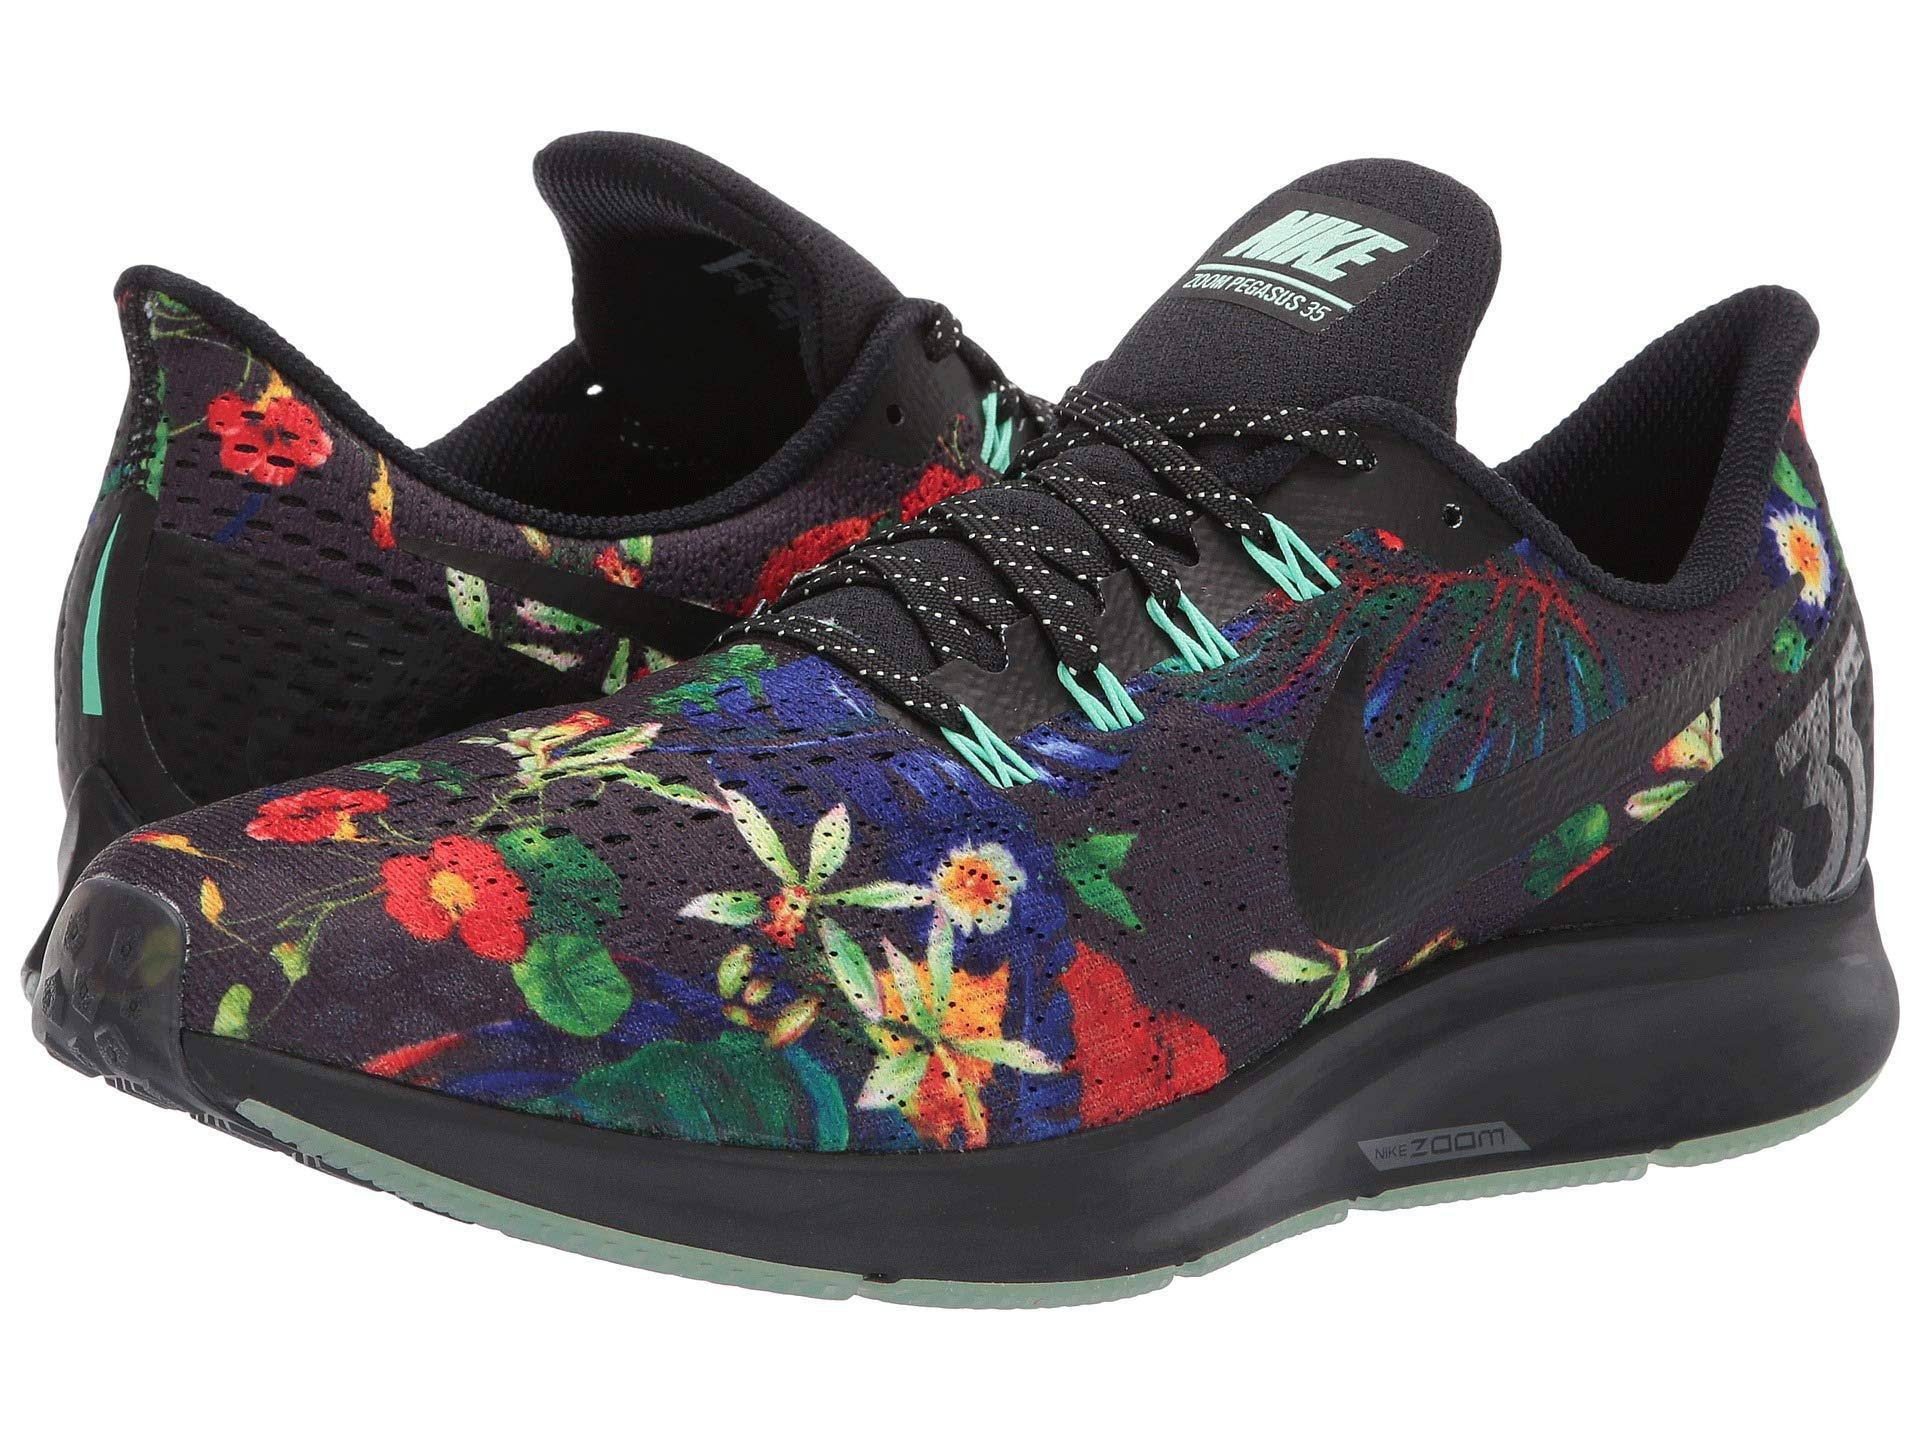 bec4bdfb5fc85 Lyst - Nike Air Zoom Pegasus 35 Gpx Rs (black black green Glow ...